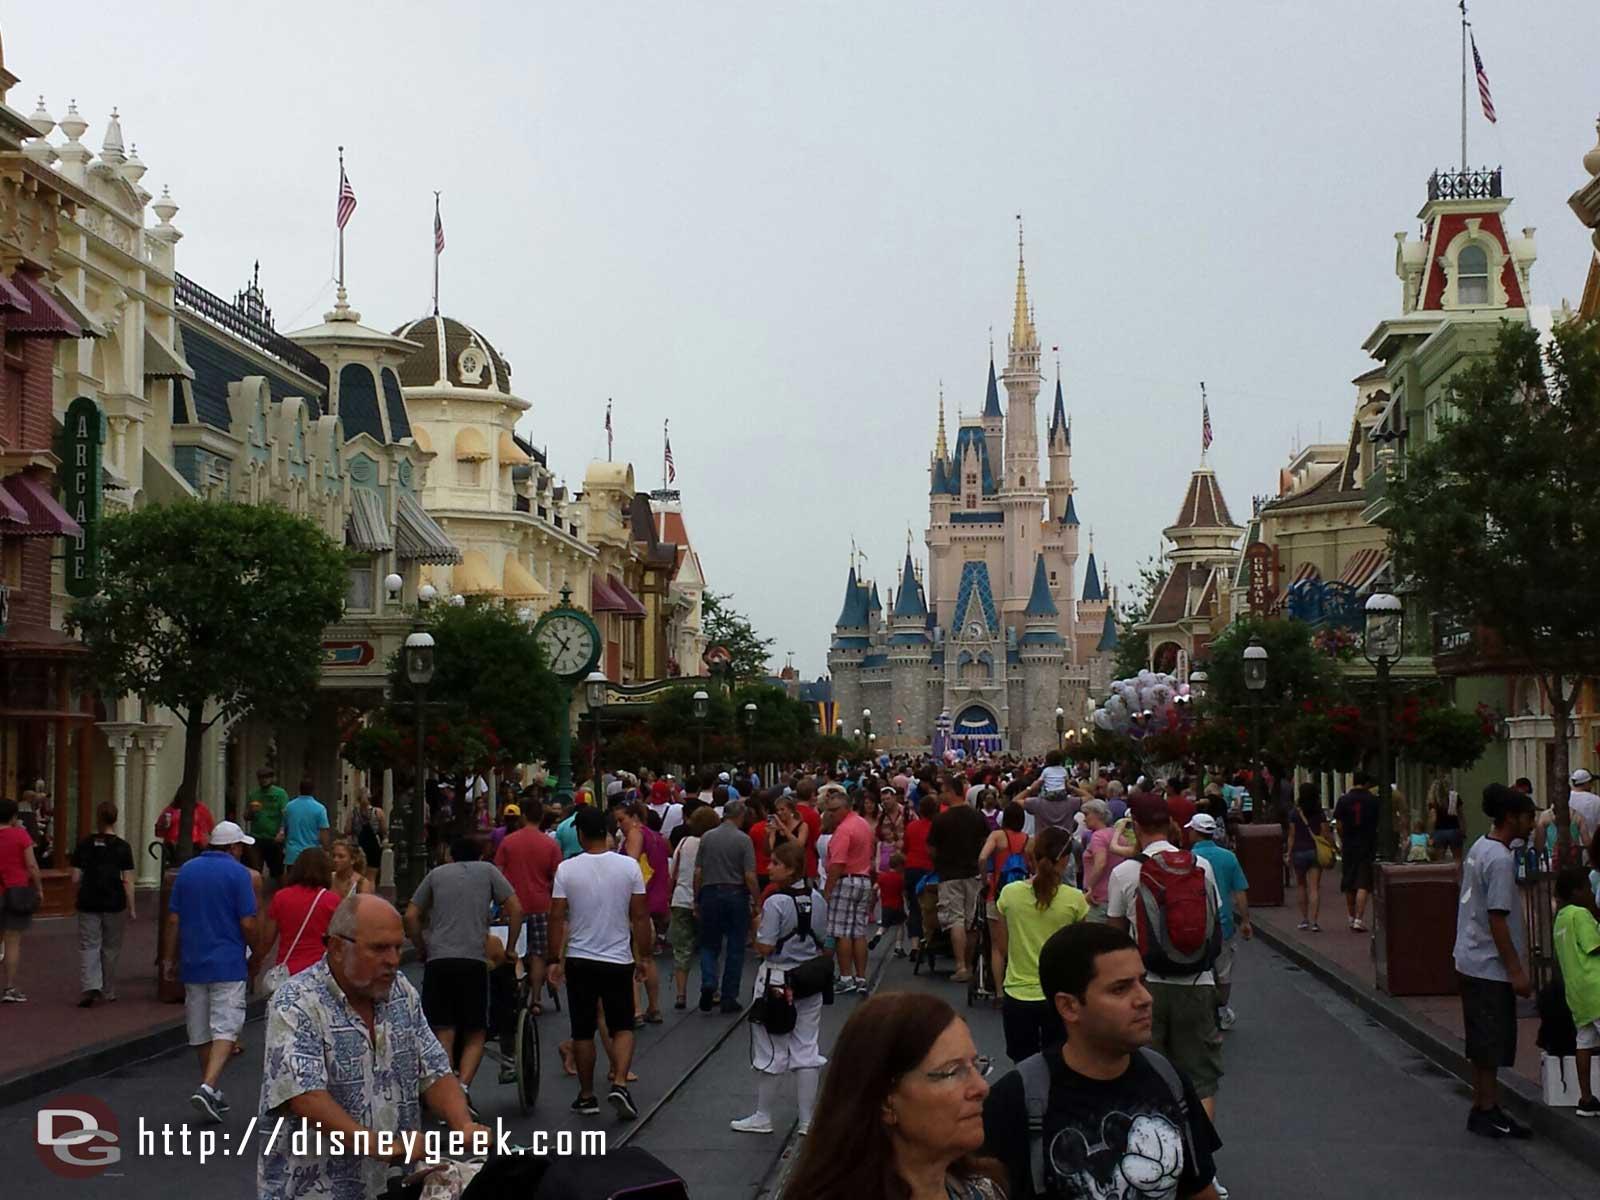 Arriving at the Magic Kingdom, Main Street USA #WDW